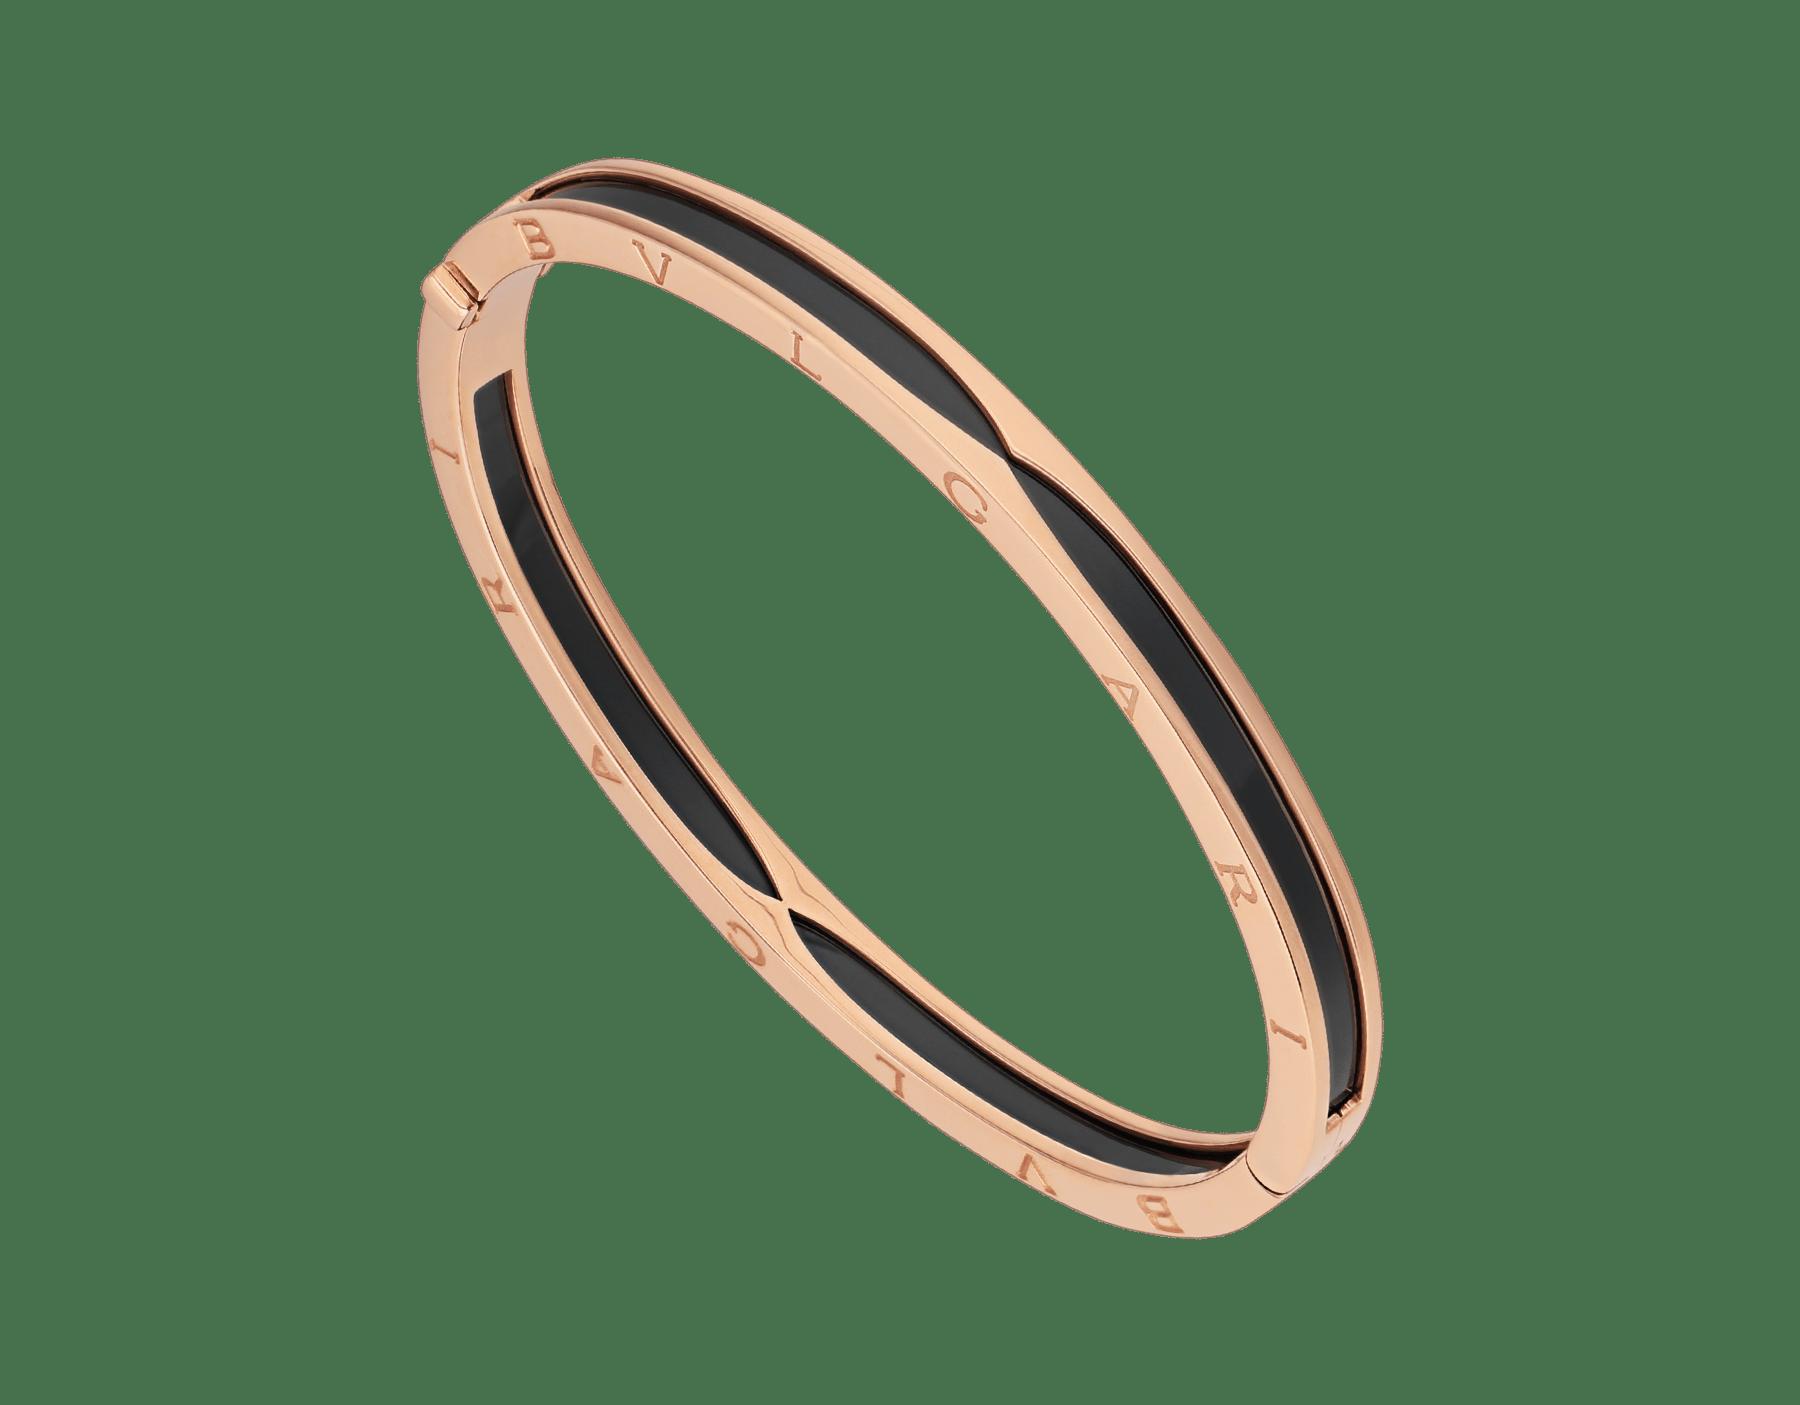 B.zero1 Armreif aus 18 Karat Roségold mit schwarzer Keramik. BR857618 image 1